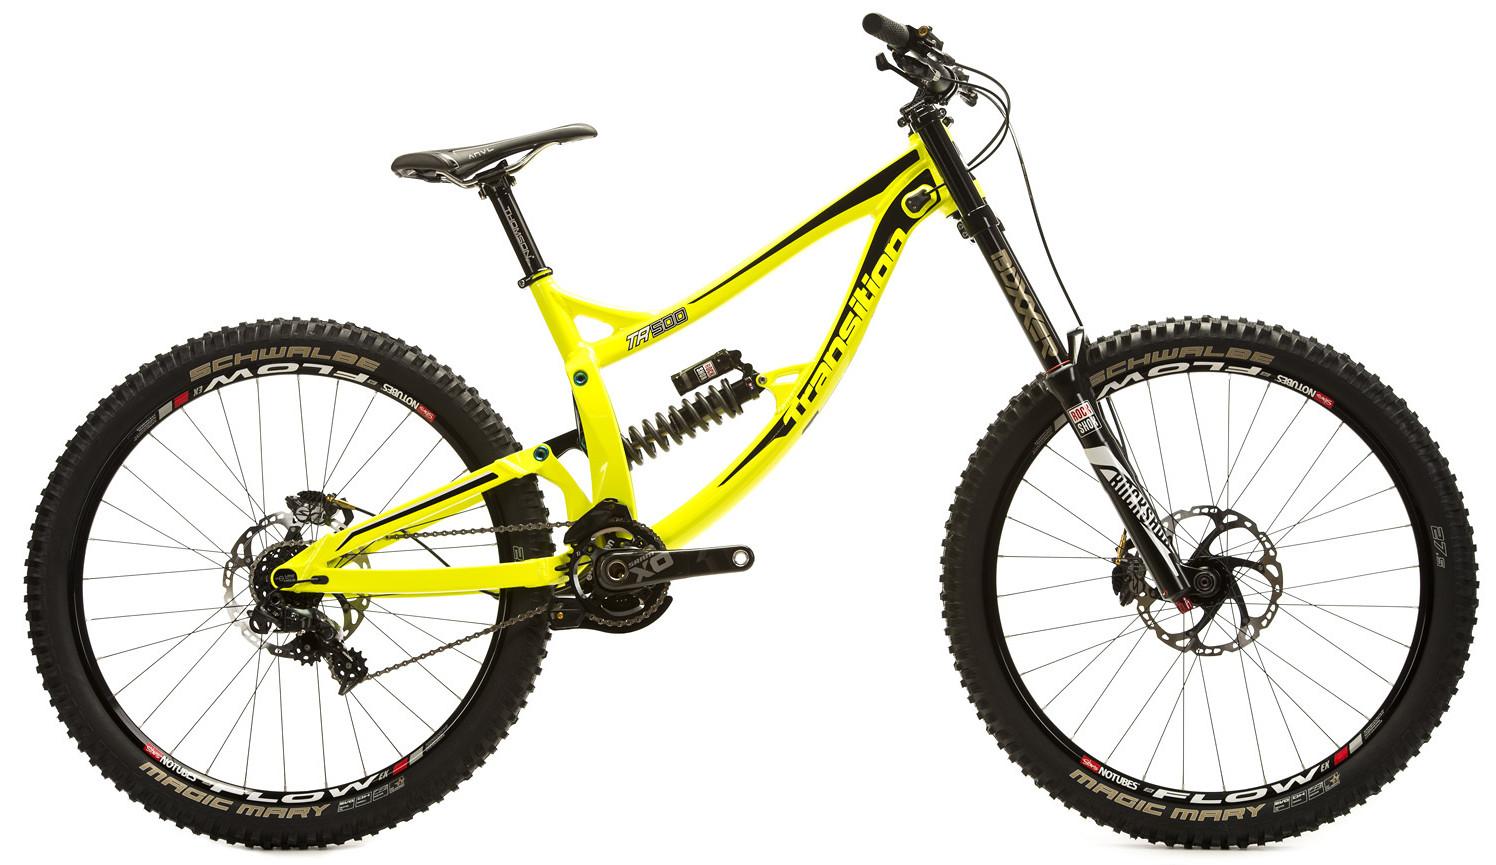 "2015 Transition TR500 1 27.5"" bike"